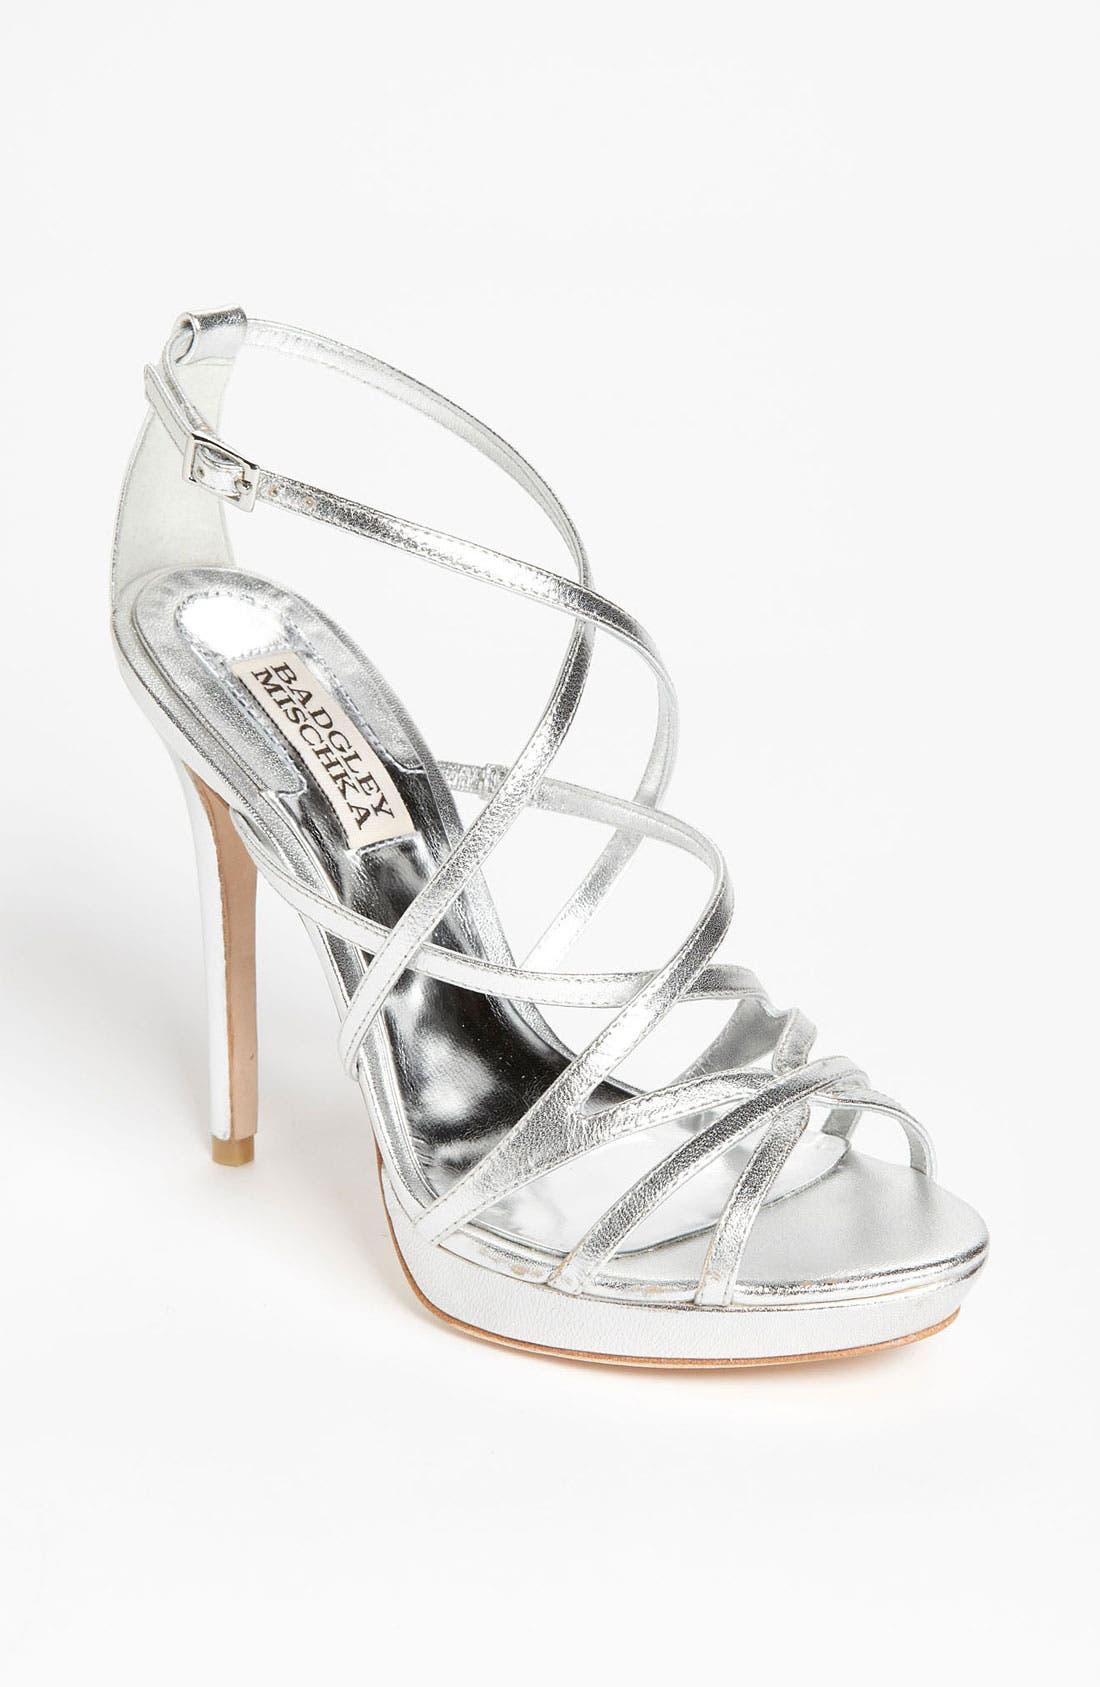 Main Image - Badgley Mischka 'Adonis II' Sandal